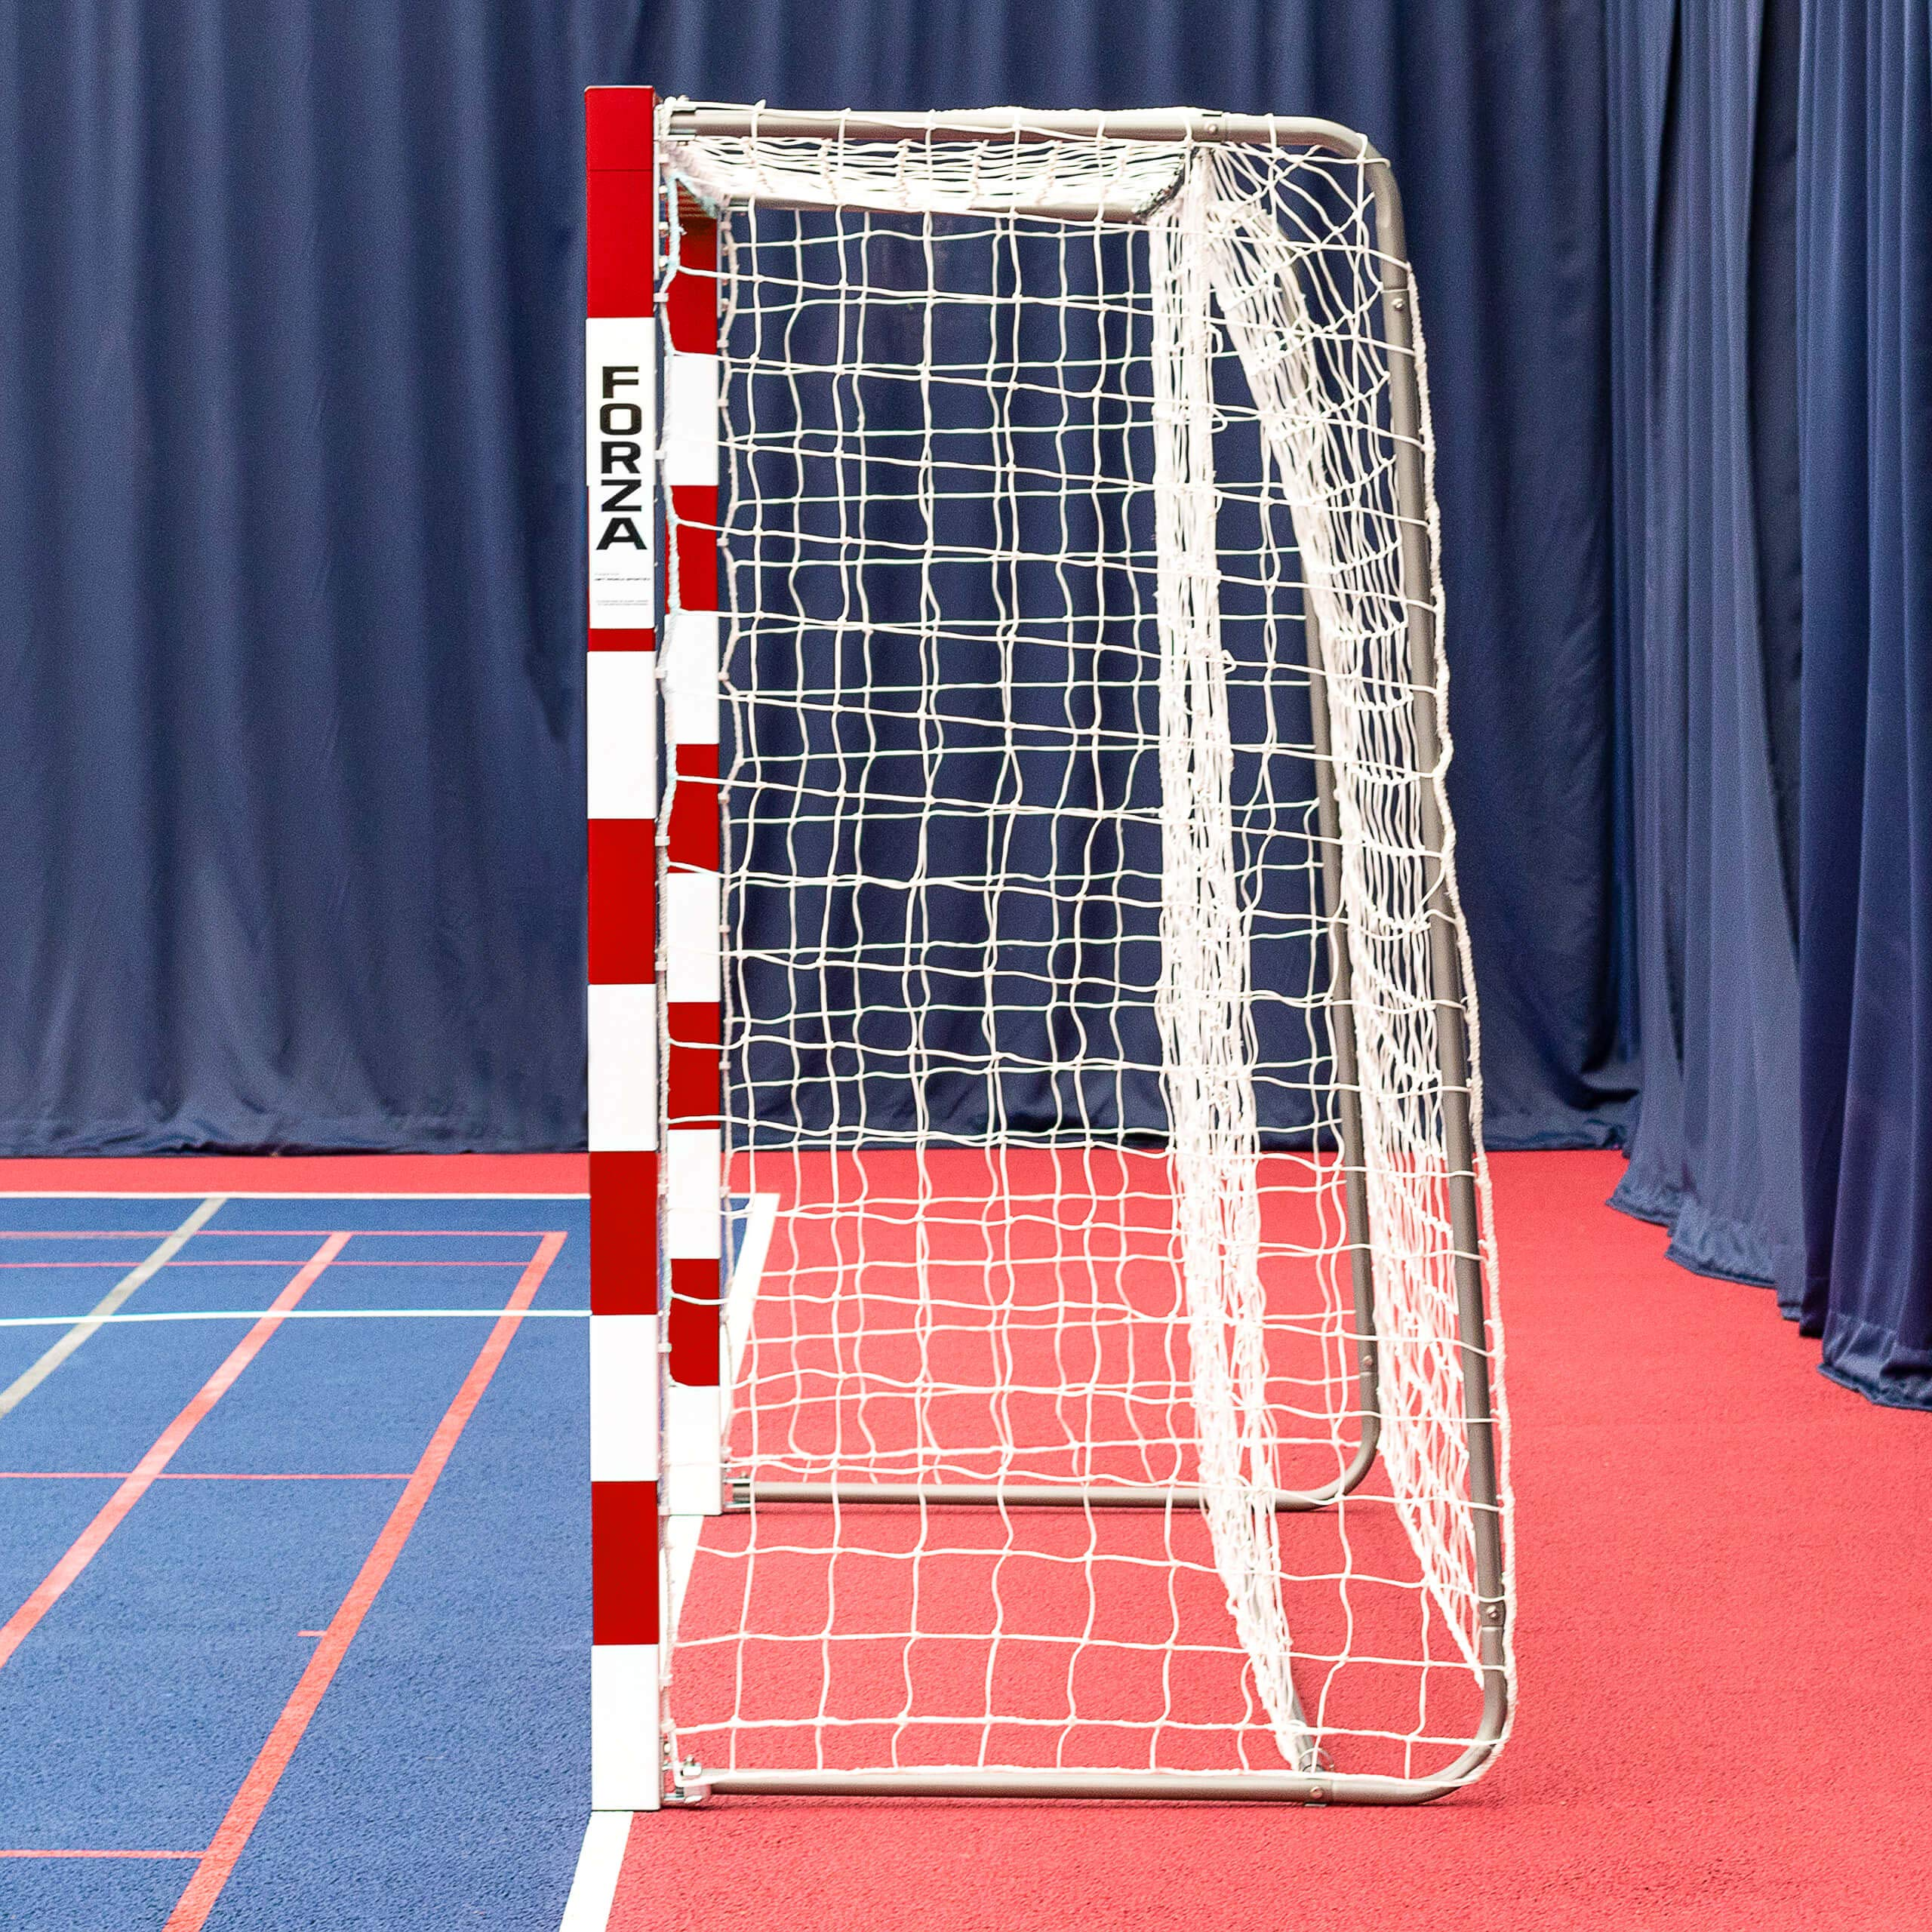 Forza Alu80 Competition Handball Goals | IHF Regulation Size 3m x 2m Handball Goal [Net World Sports] (Pair, Red) by Forza (Image #2)